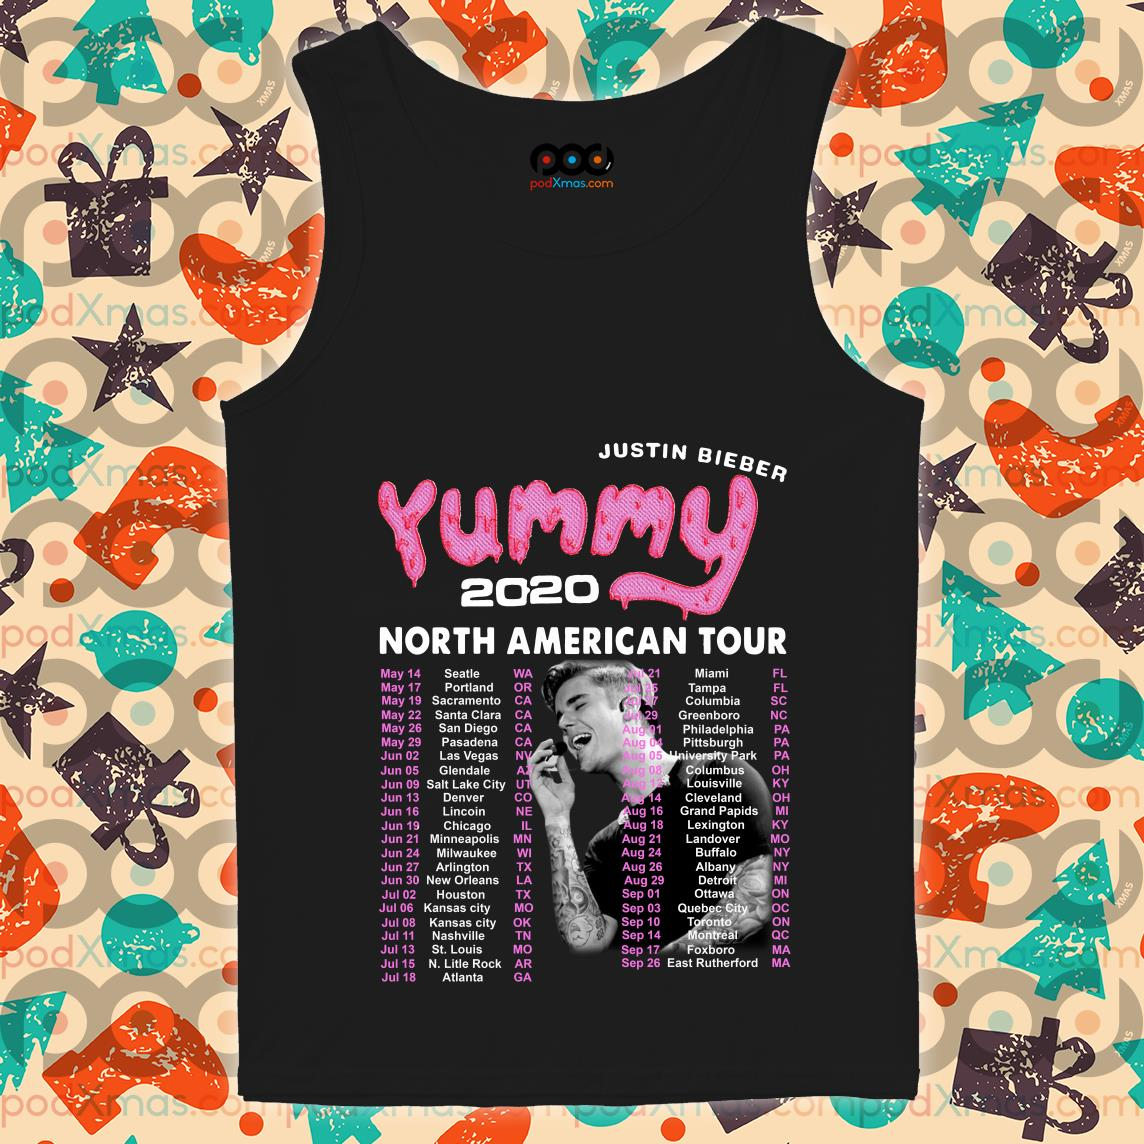 Justin Bieber Yummy 2020 North American Tour tank top